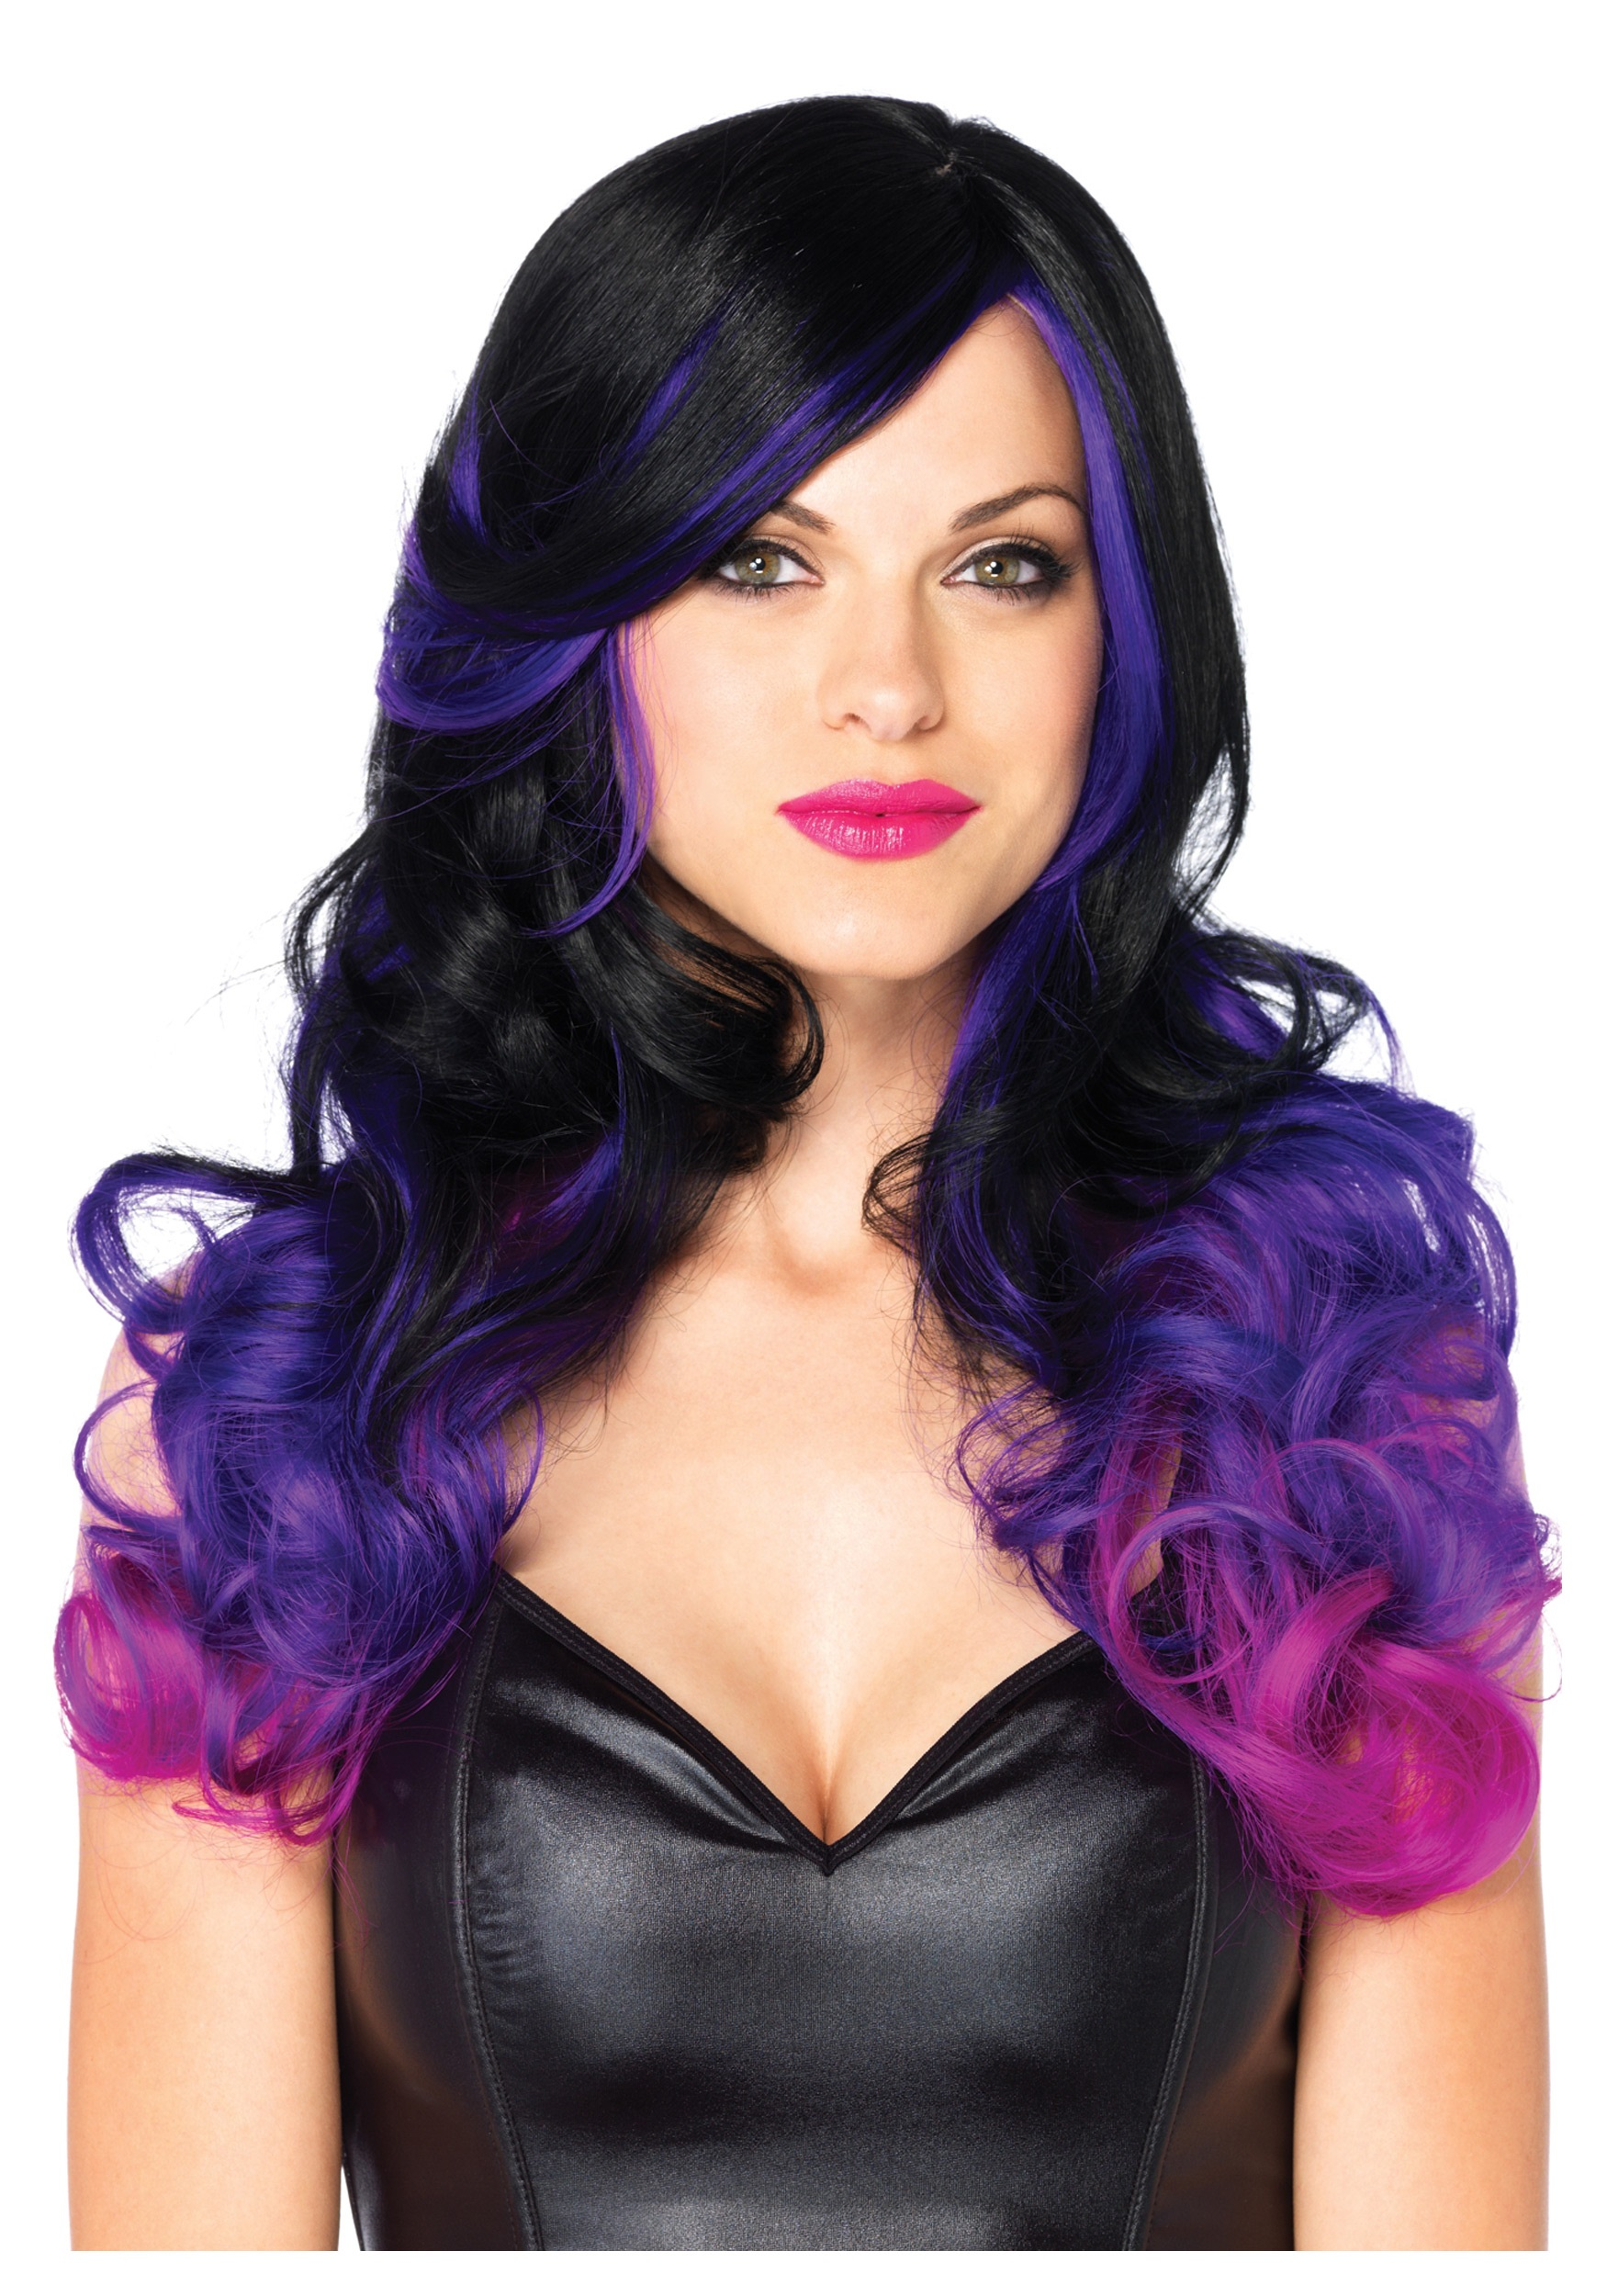 purple and black costume two-tone wig accessory